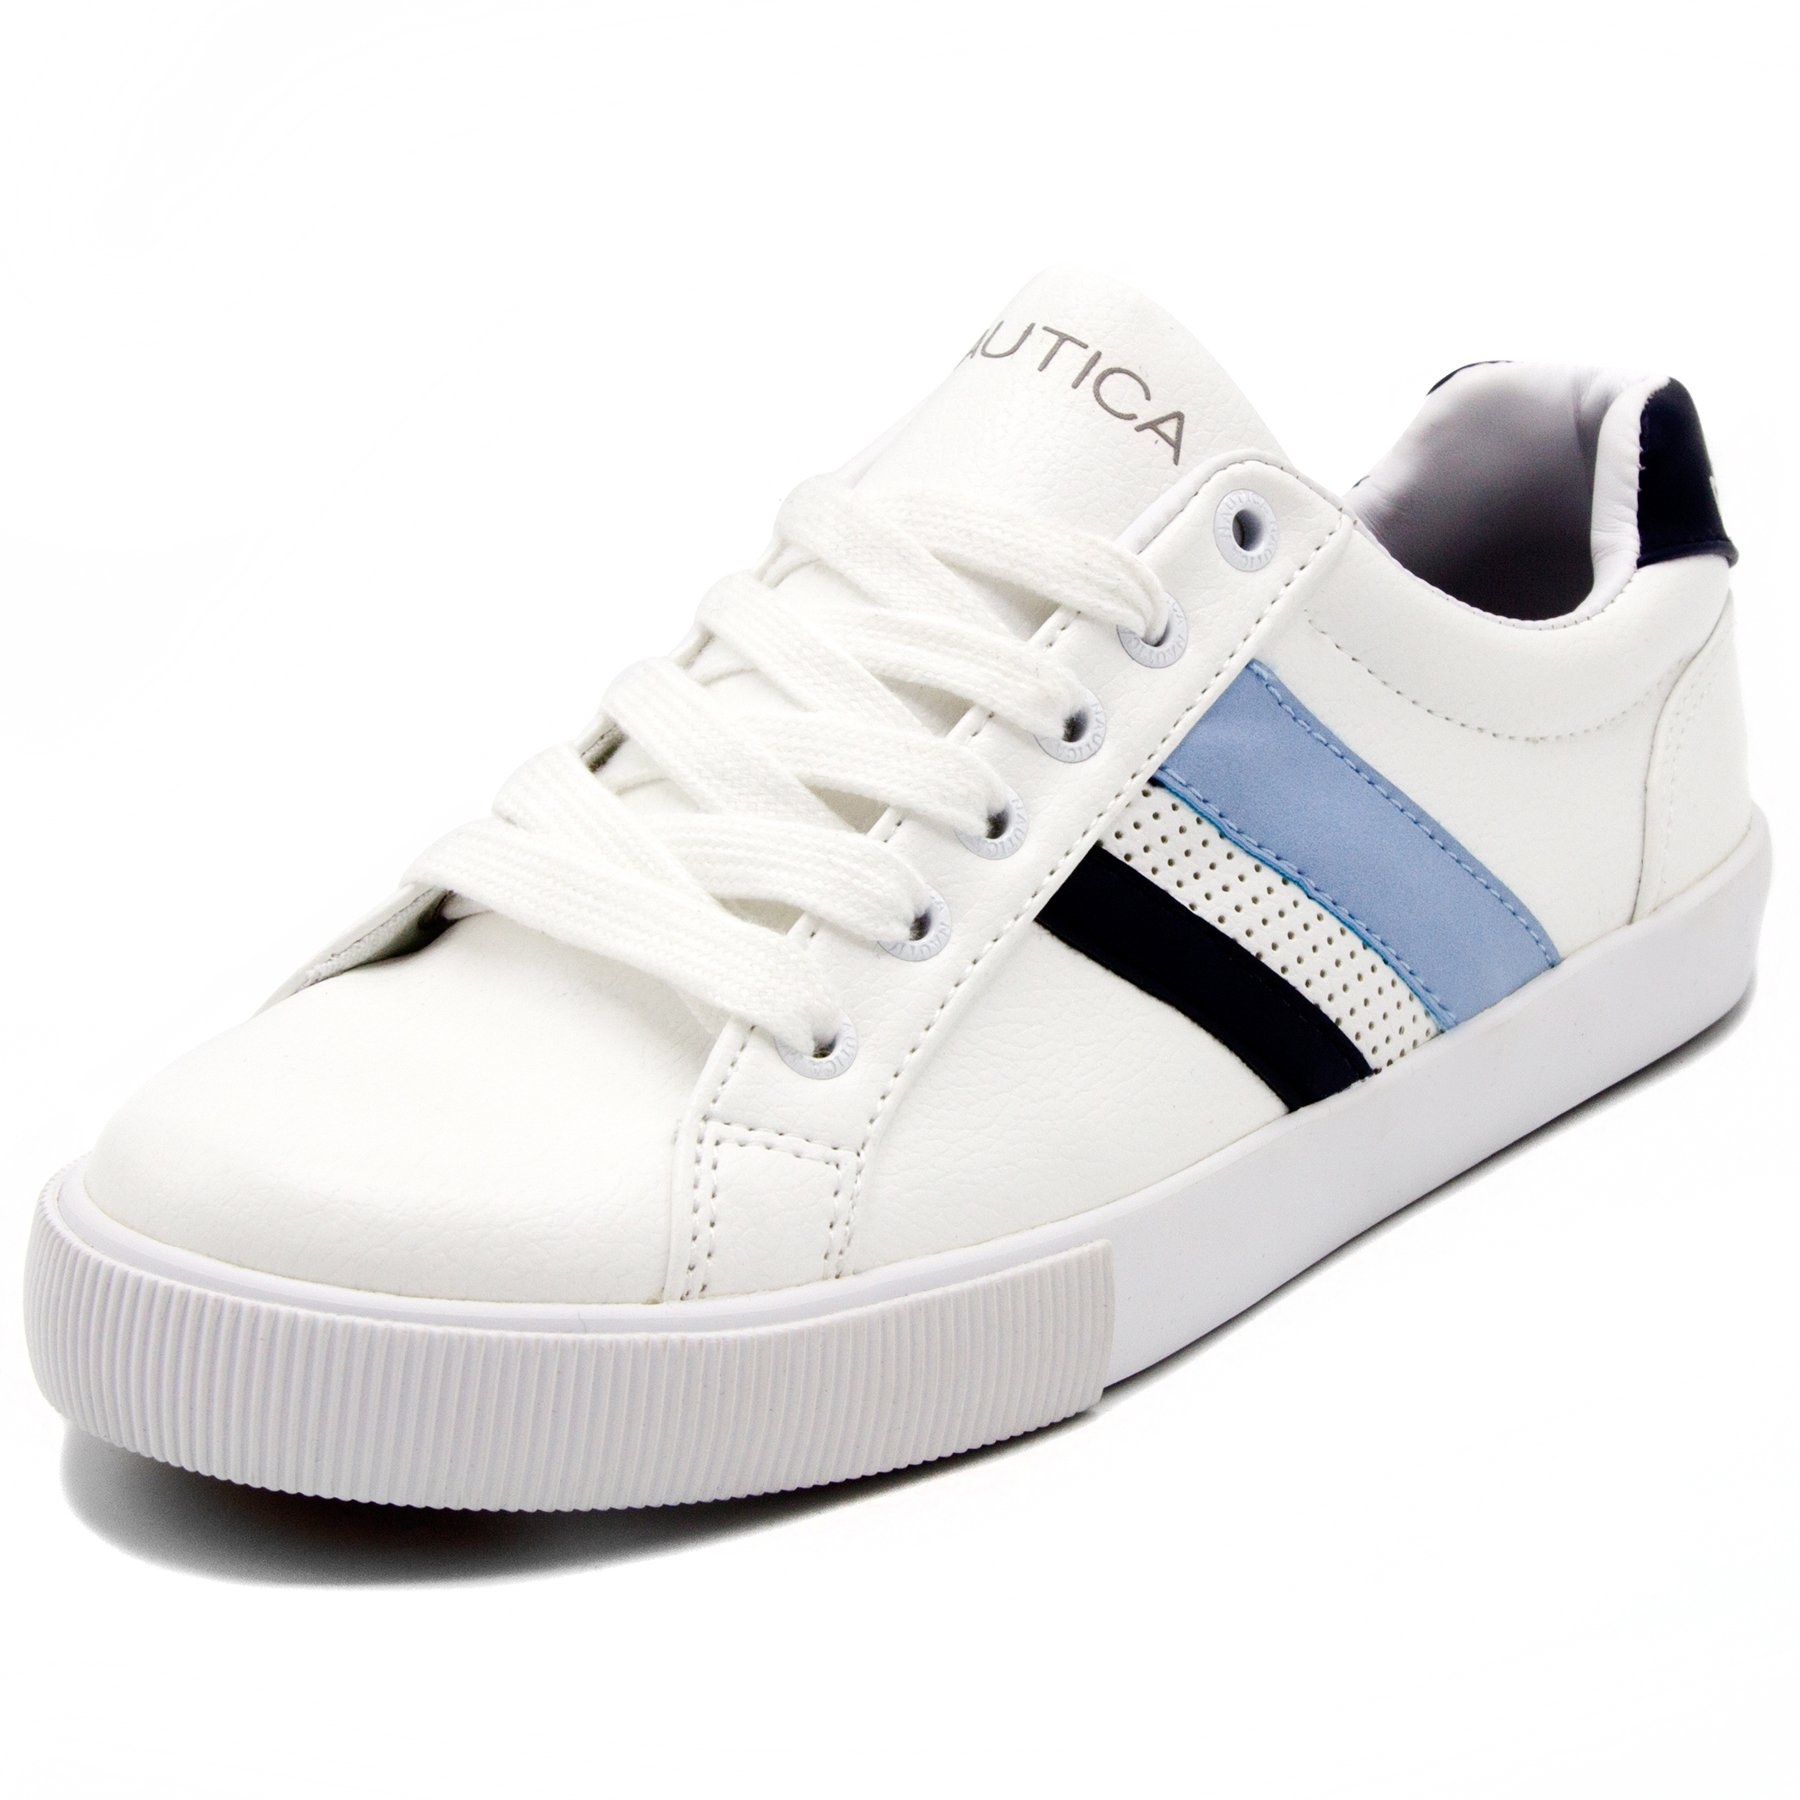 Nautica Steam 4 Women Lace - Up Fashion Sneaker Casual Shoes -Peacoat Multi-7